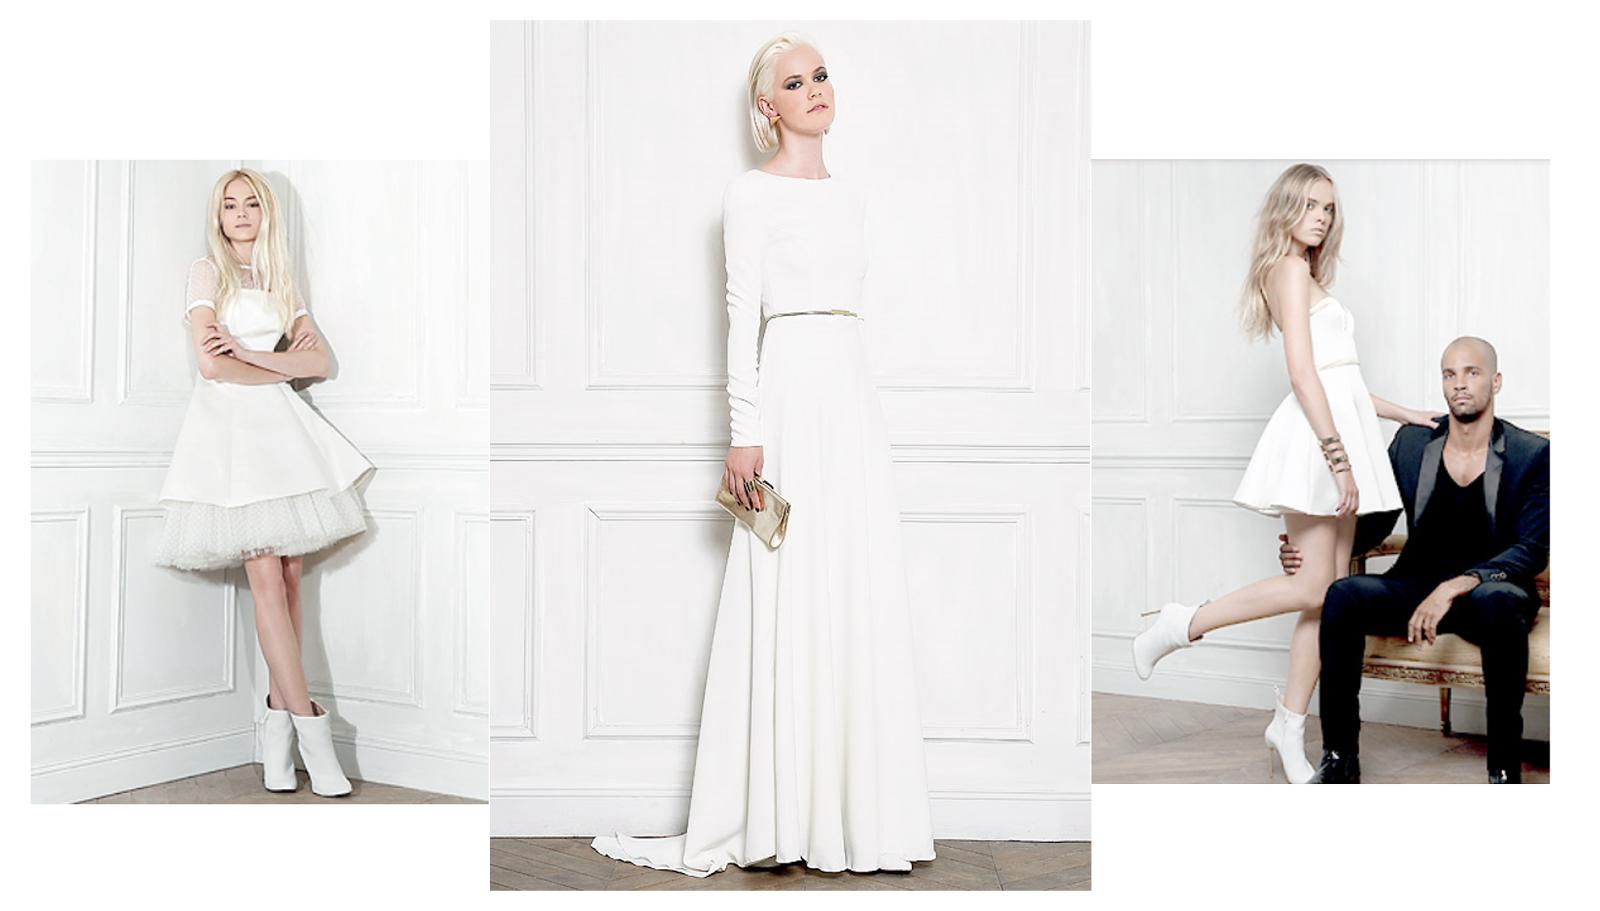 Robes de mariée collection William Carmimola pour Tati wedding moderne rock